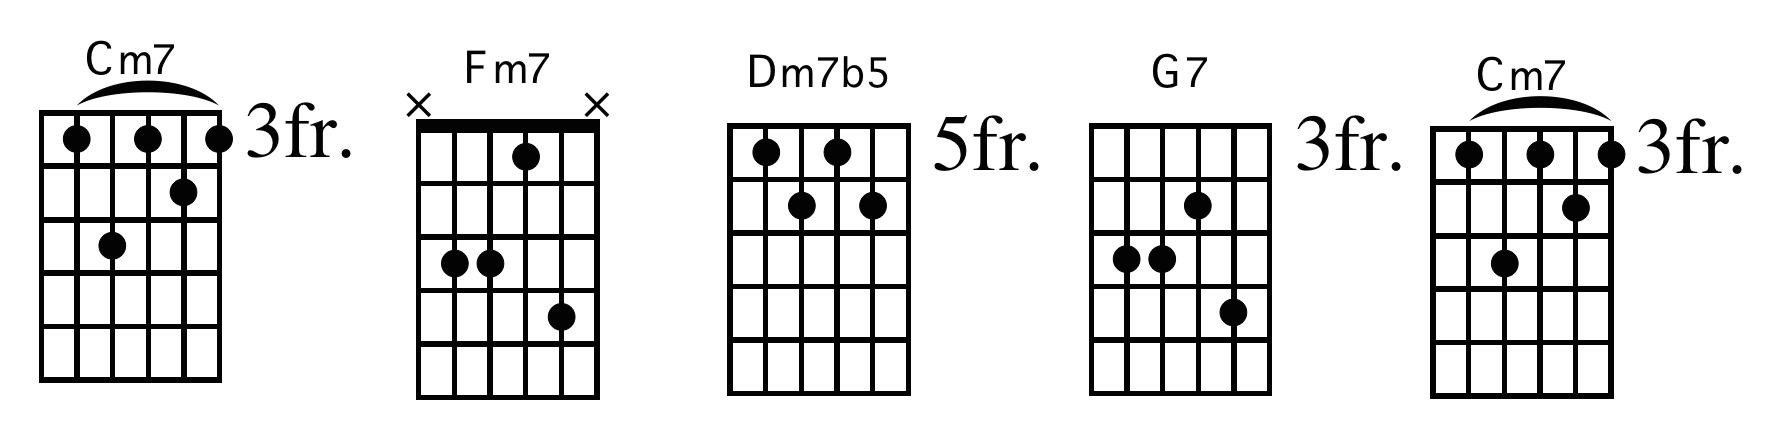 jazz-guitar-practice-routine_3.png